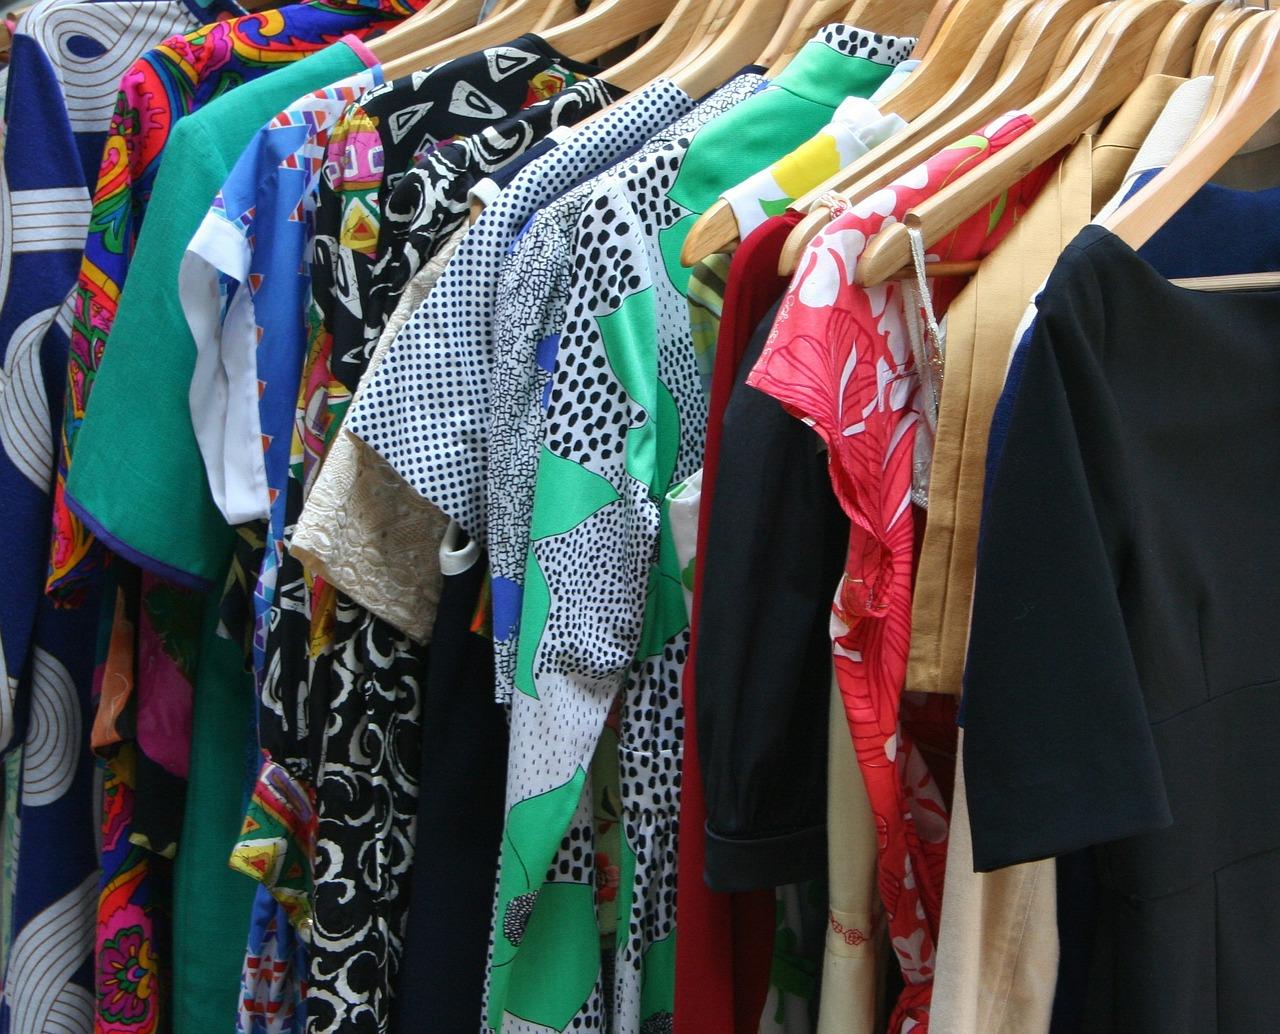 Shopping at Lorena Saravia is never a bad idea | Pixabay